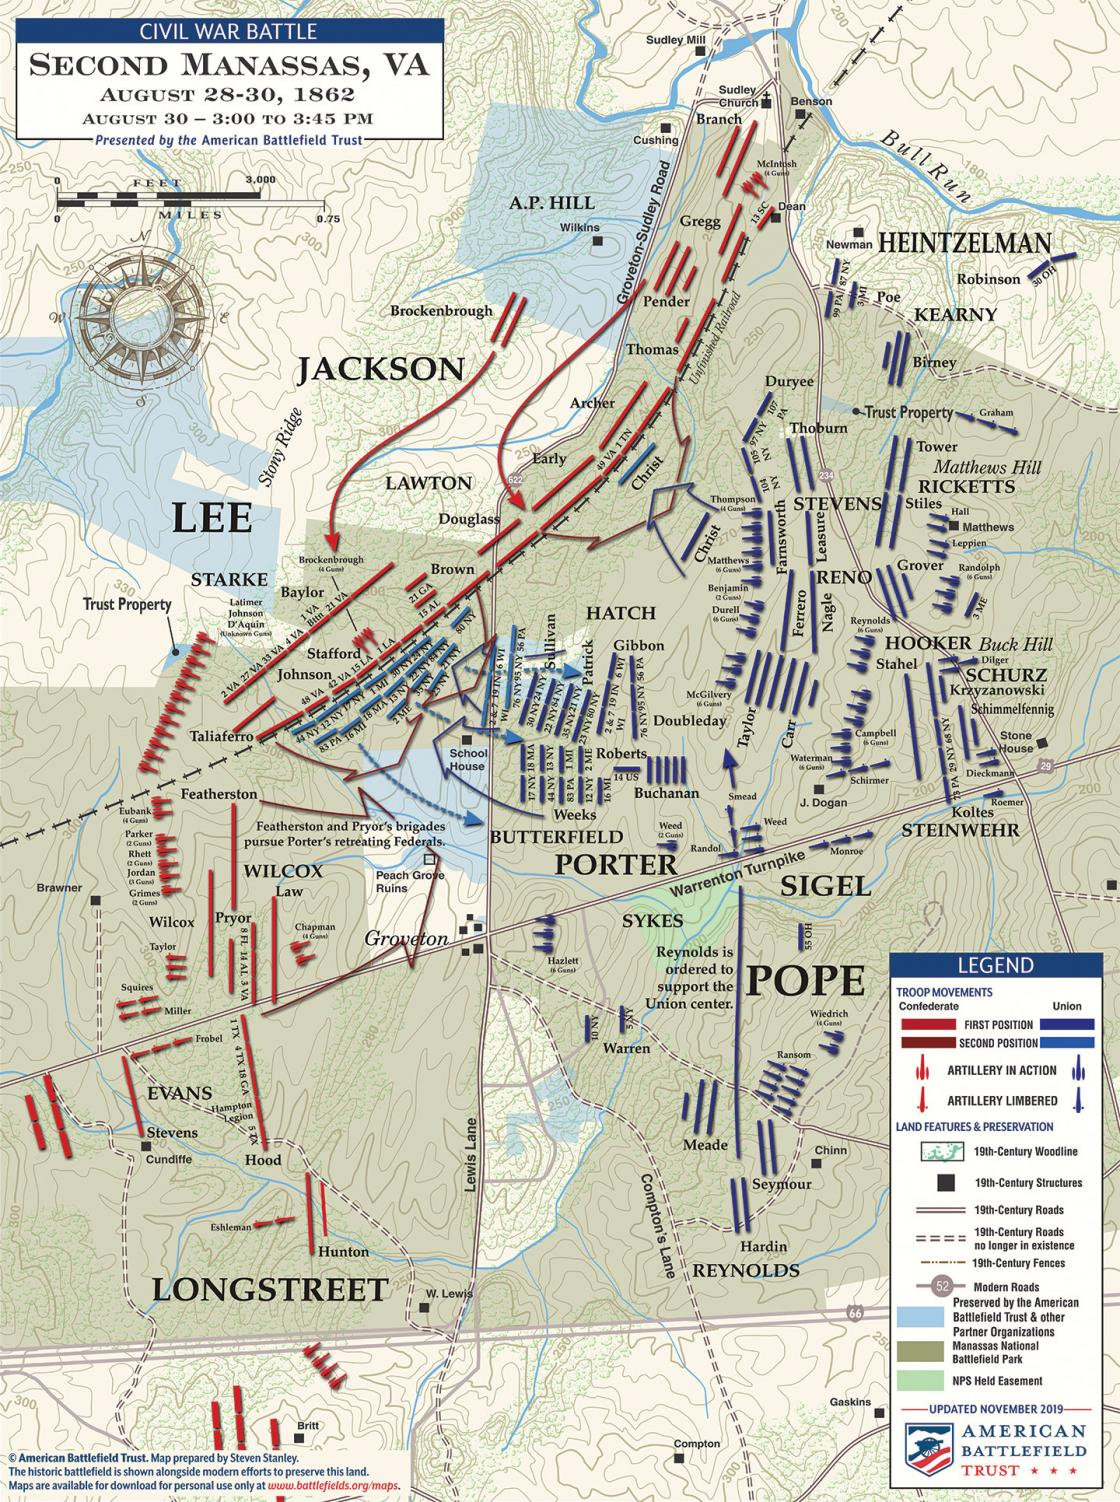 Second Manassas - Porter's Attack - August 30, 1862 - 3pm to 3:45pm (November 2019)